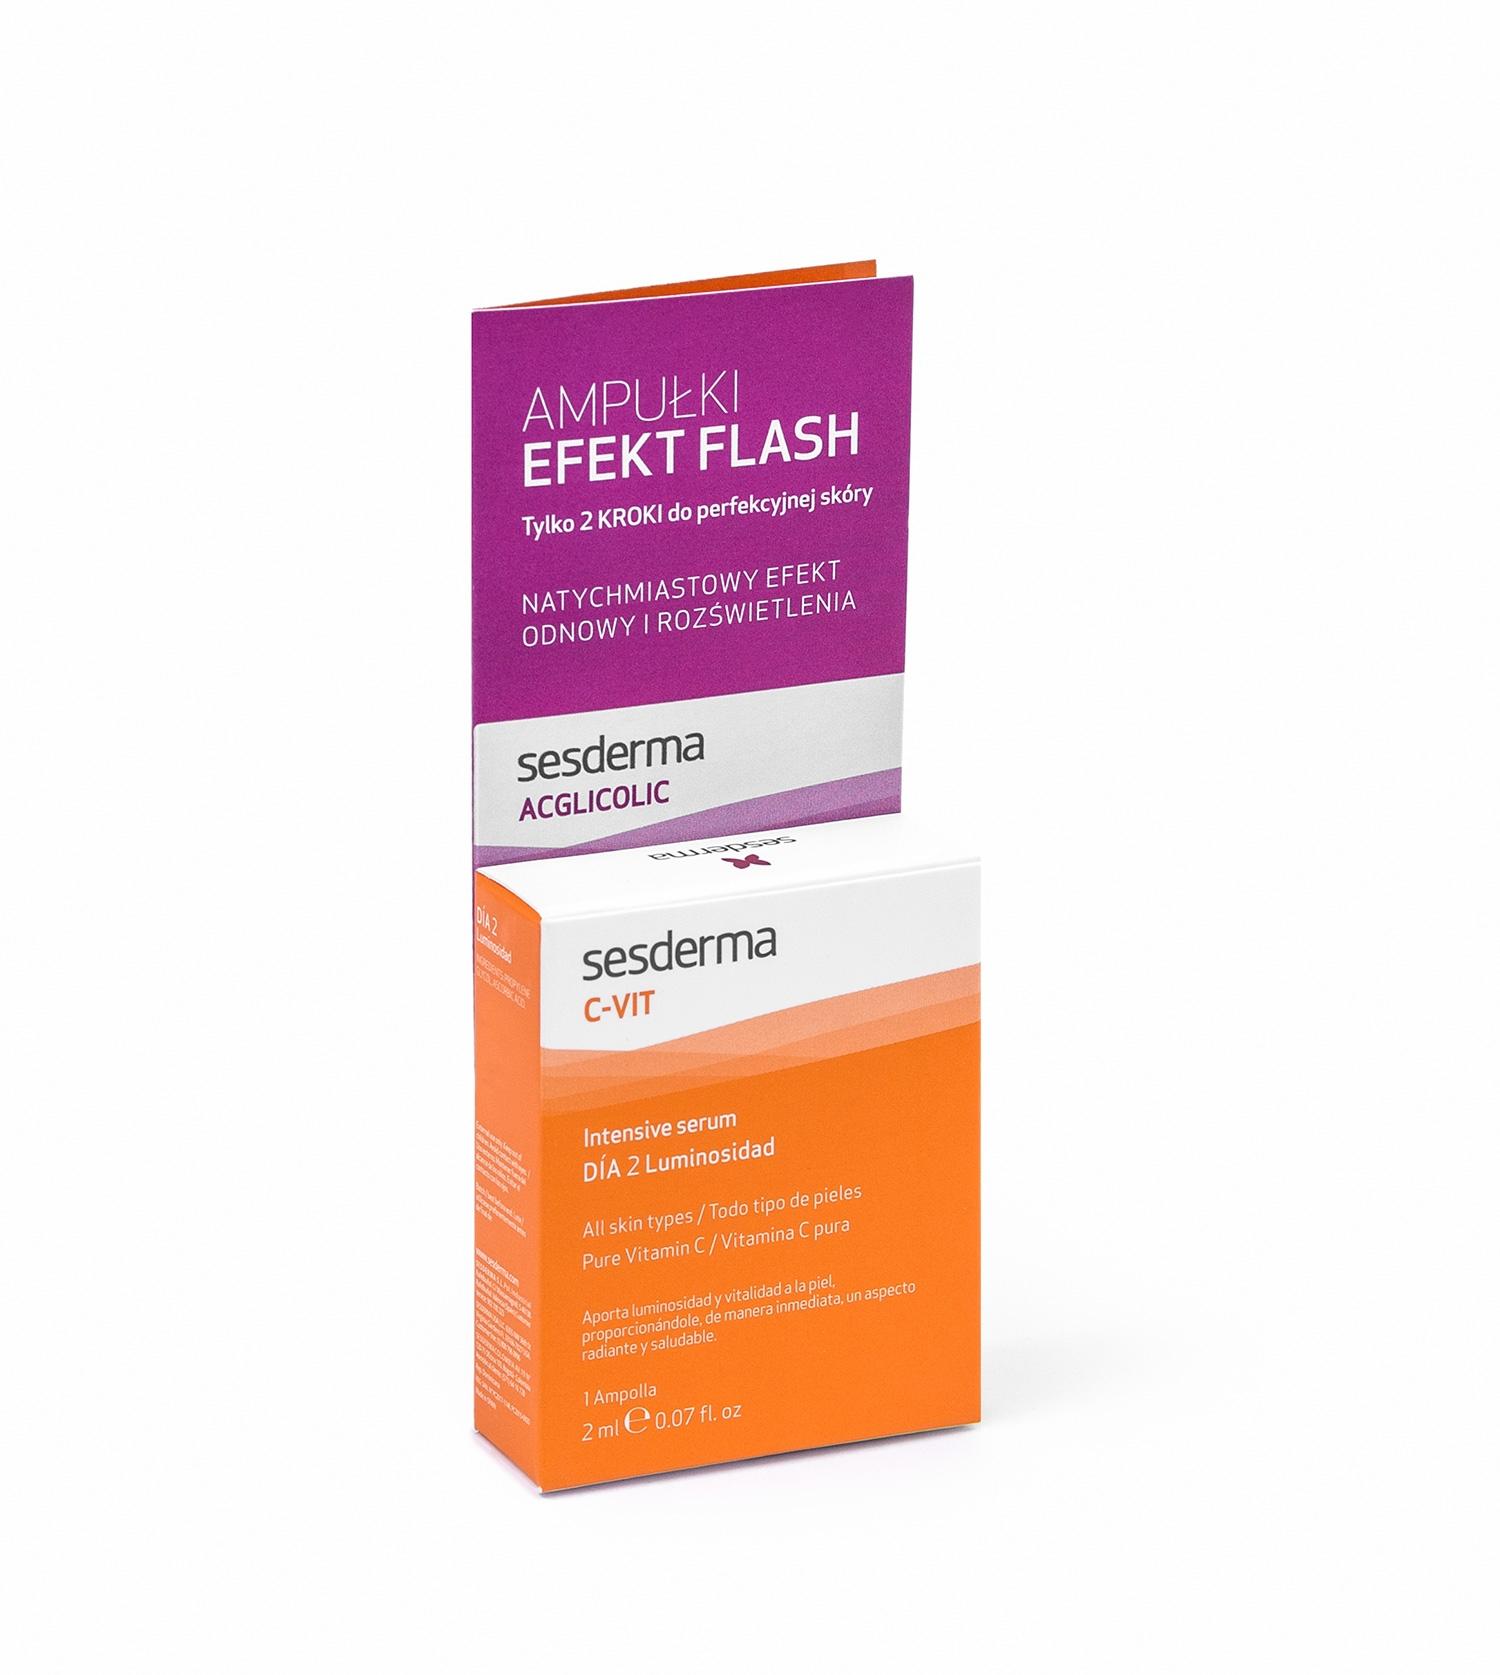 EFEKT FLASH Acglicolic + C-VIT 12%